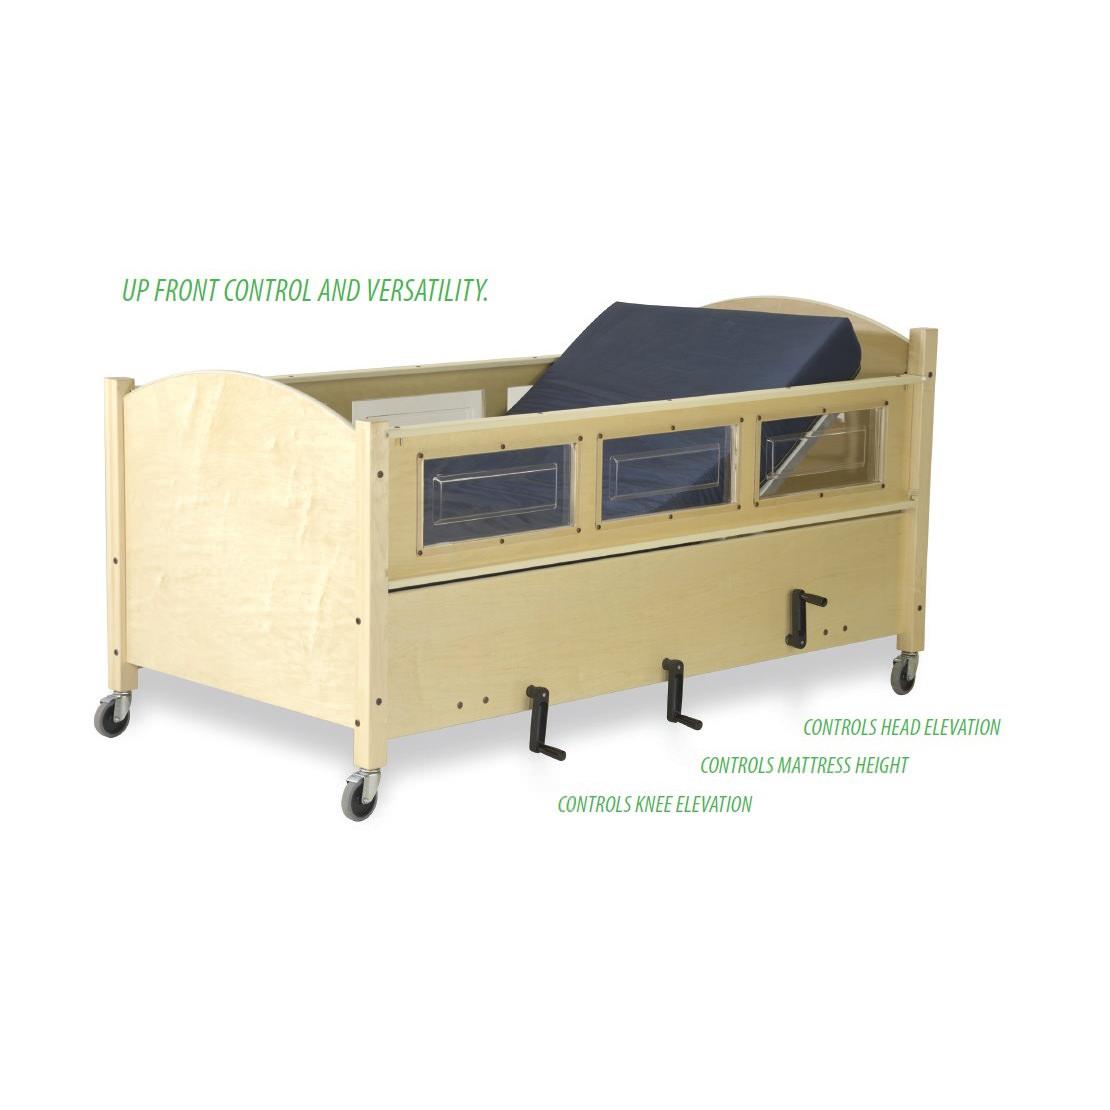 SleepSafe2 manual height adjustable bed